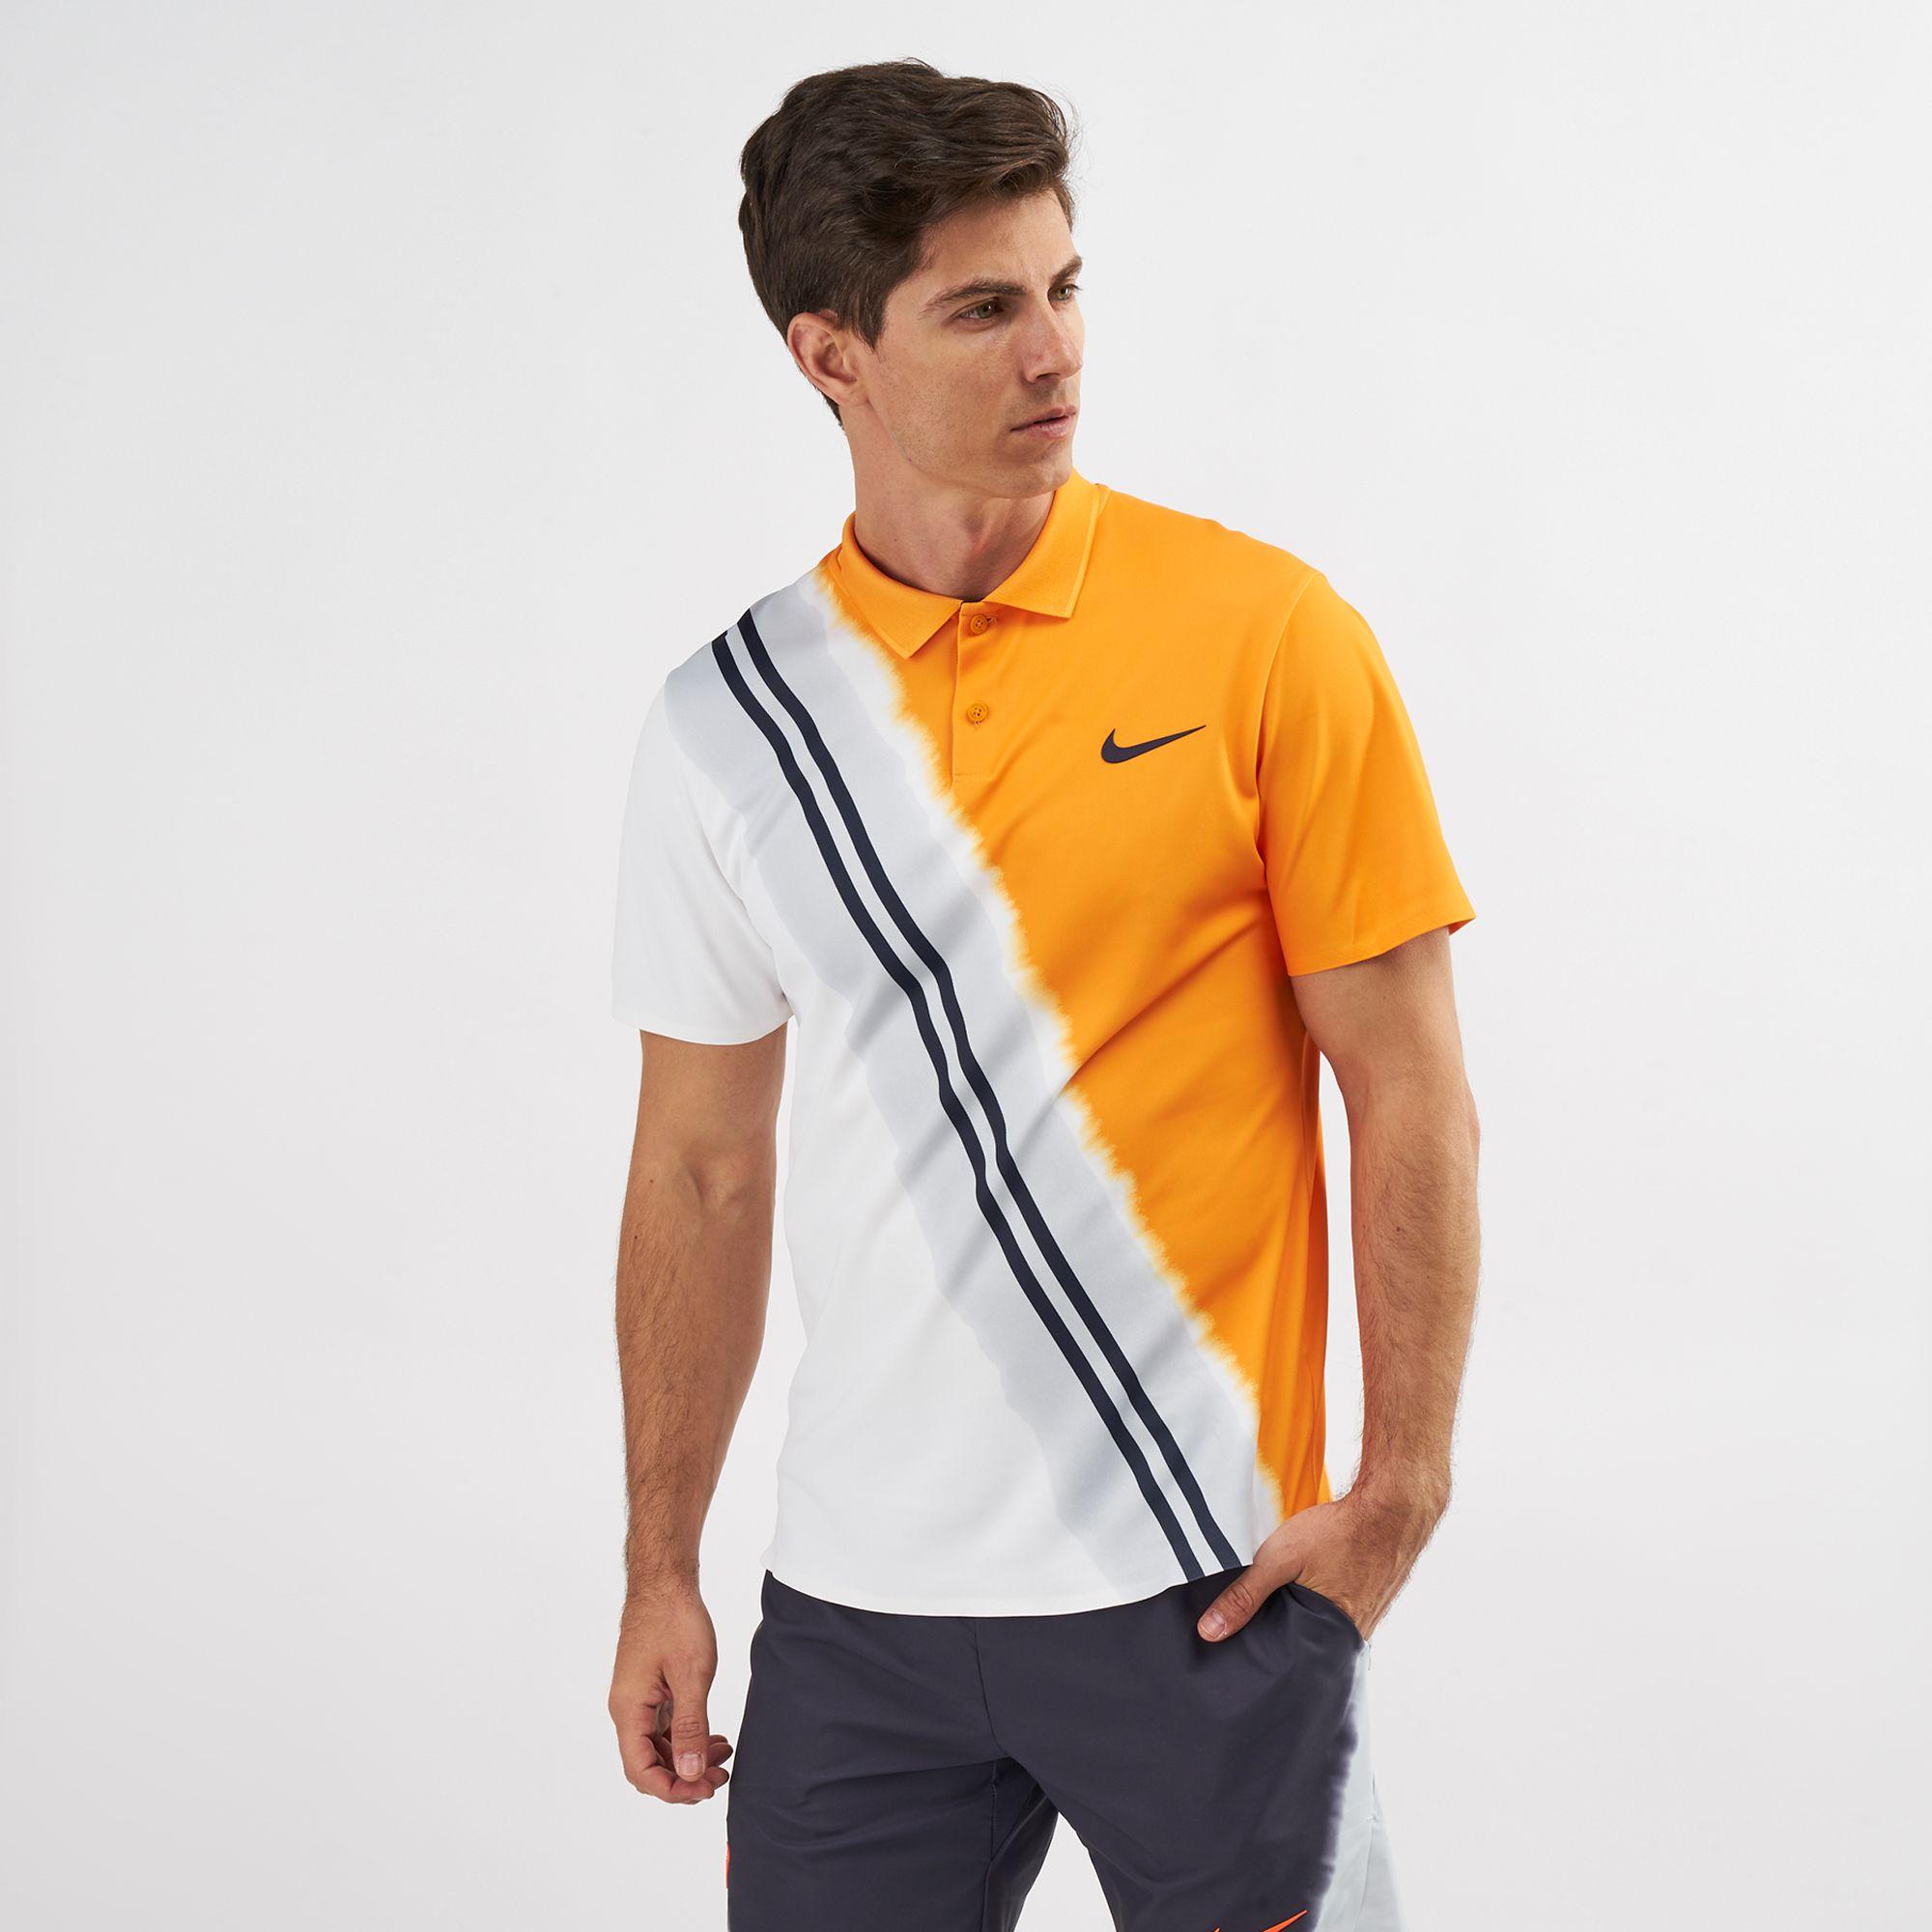 b77d70cf Nike Court Advantage Tennis Polo T-Shirt   Polo Shirts   Tops   Clothing    Mens   SSS